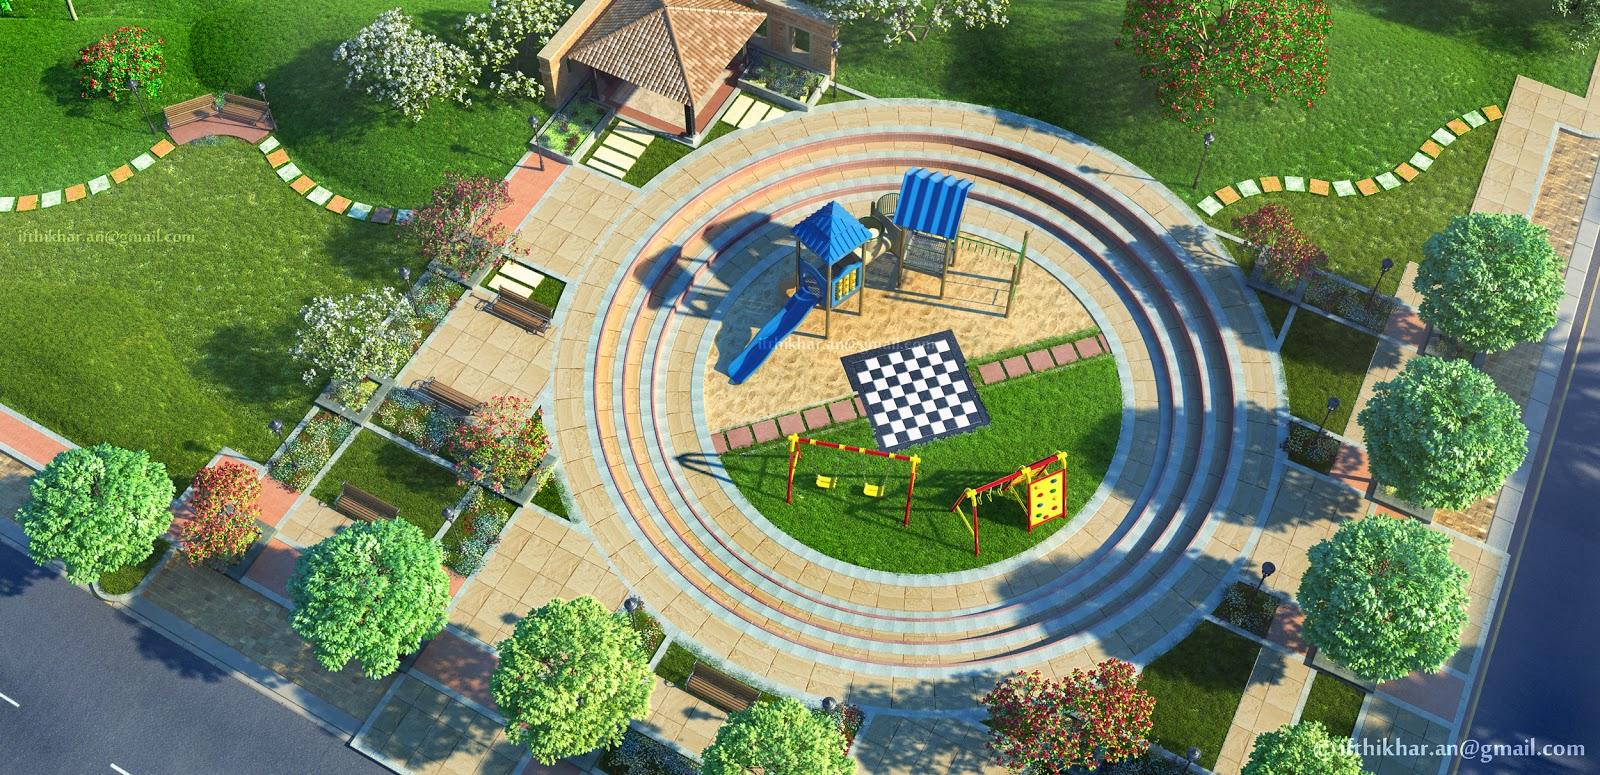 3d Exterior Landscape Visualization For A Group Housing